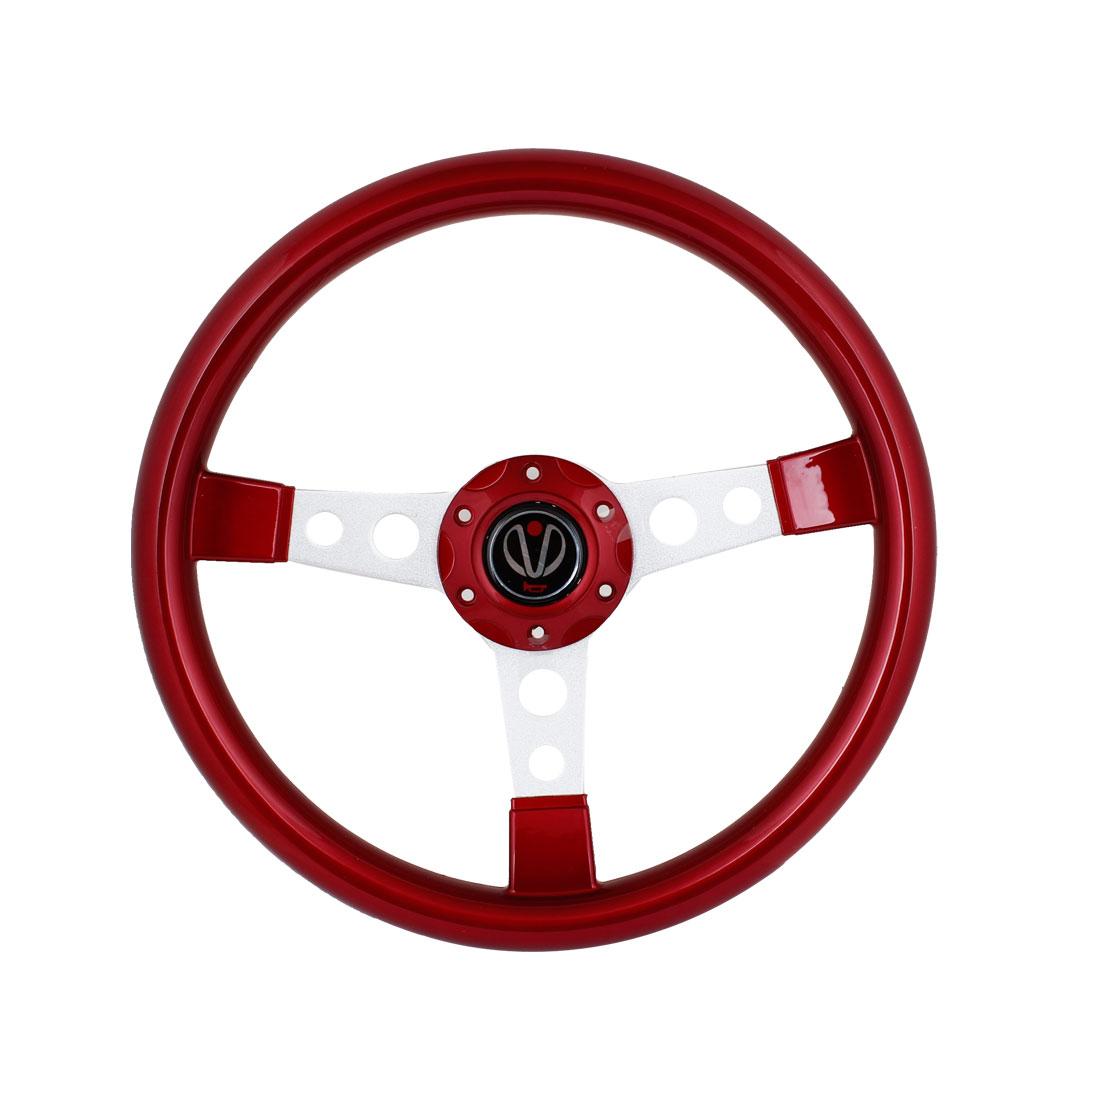 34.5cm Dia Red Plastic Nonslip Racing Steering Wheel for Car